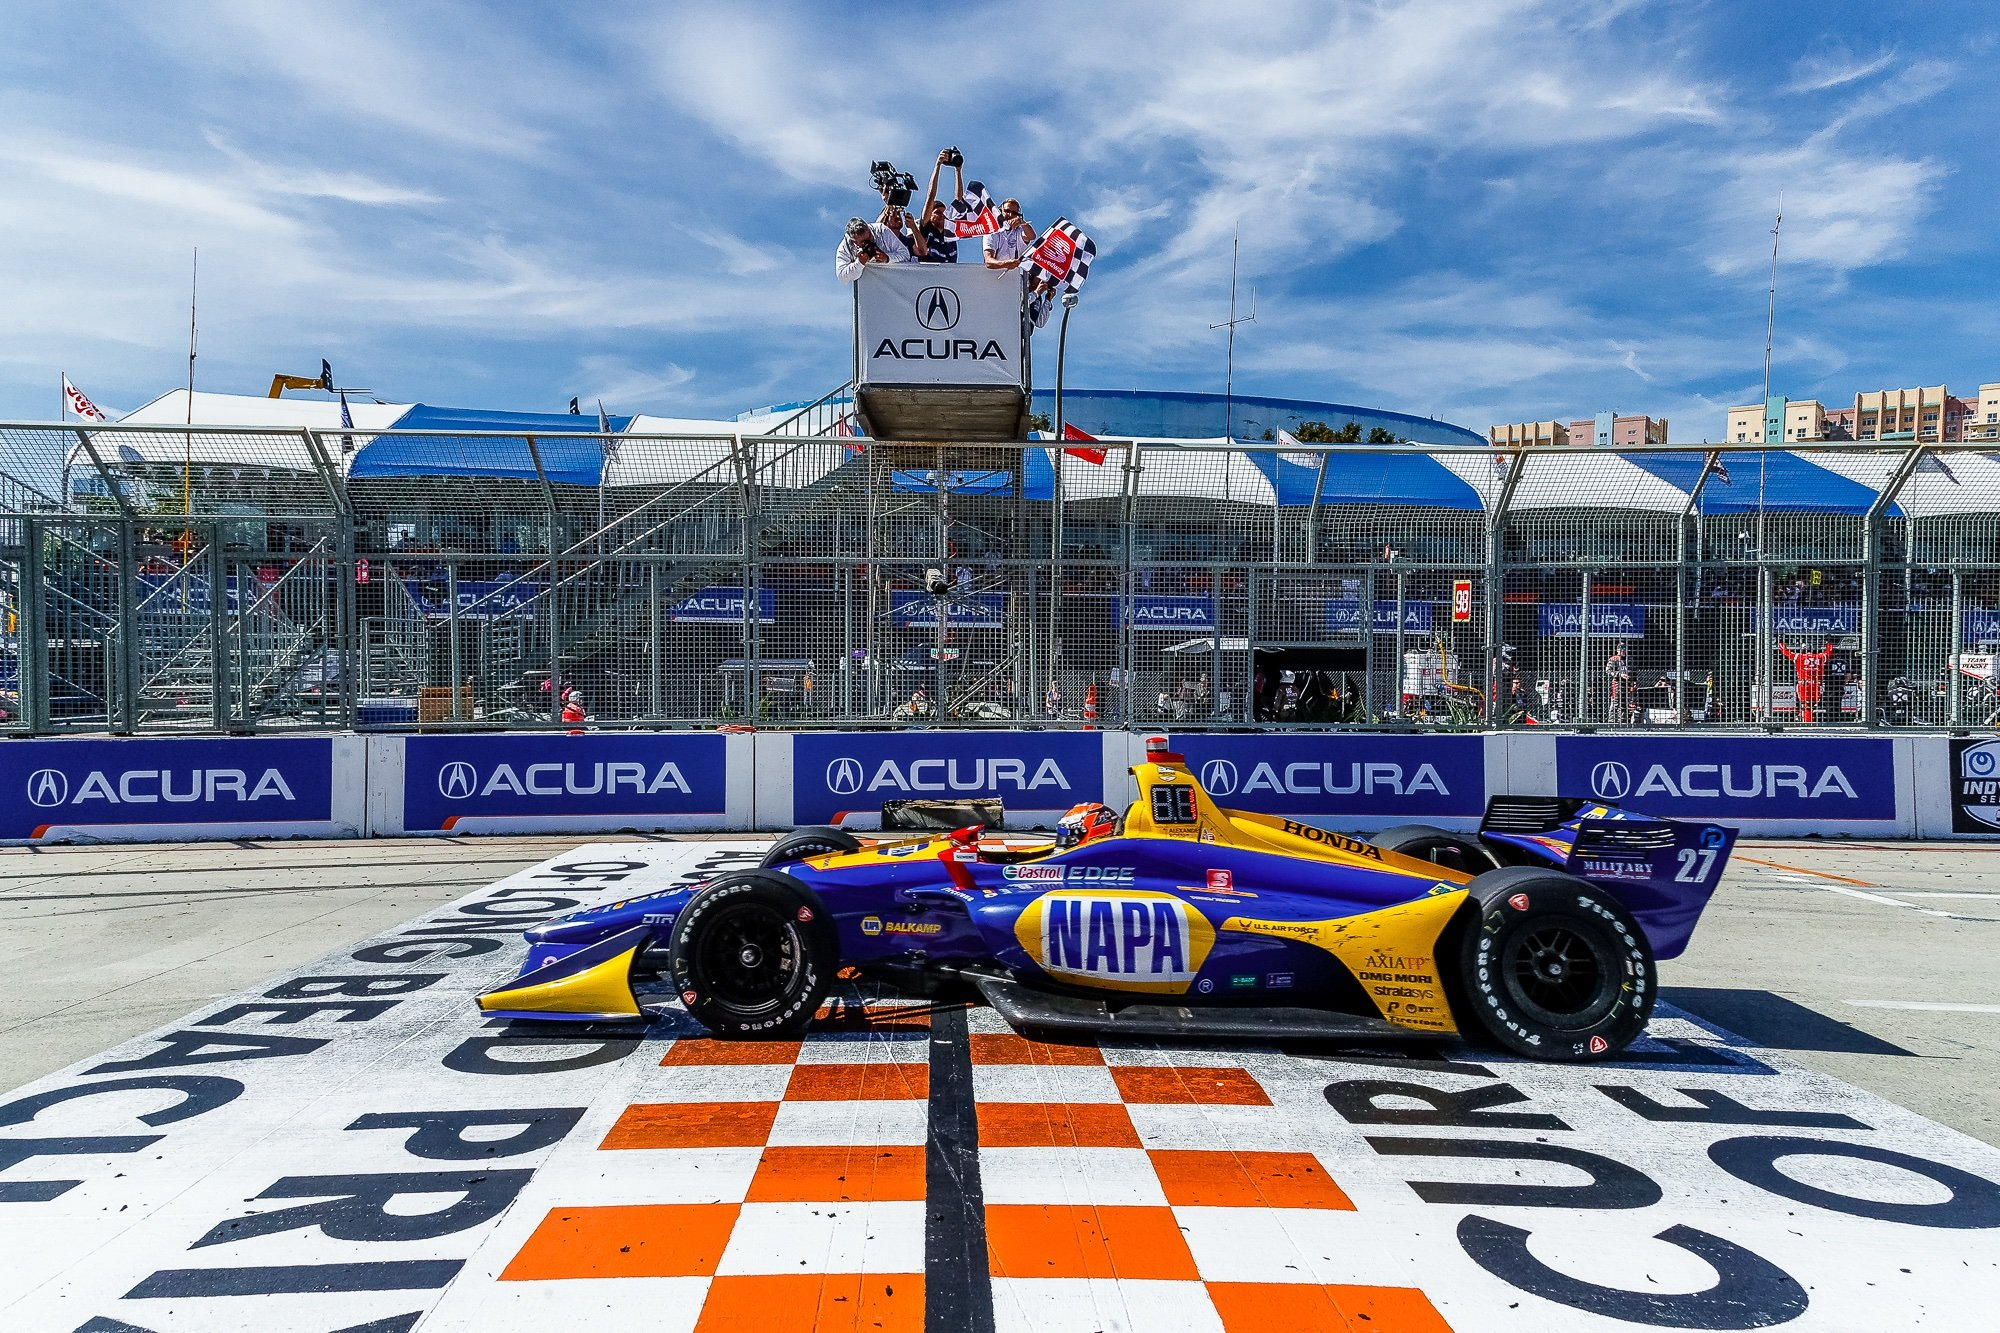 Long Beach Grand Prix - Indycar Series